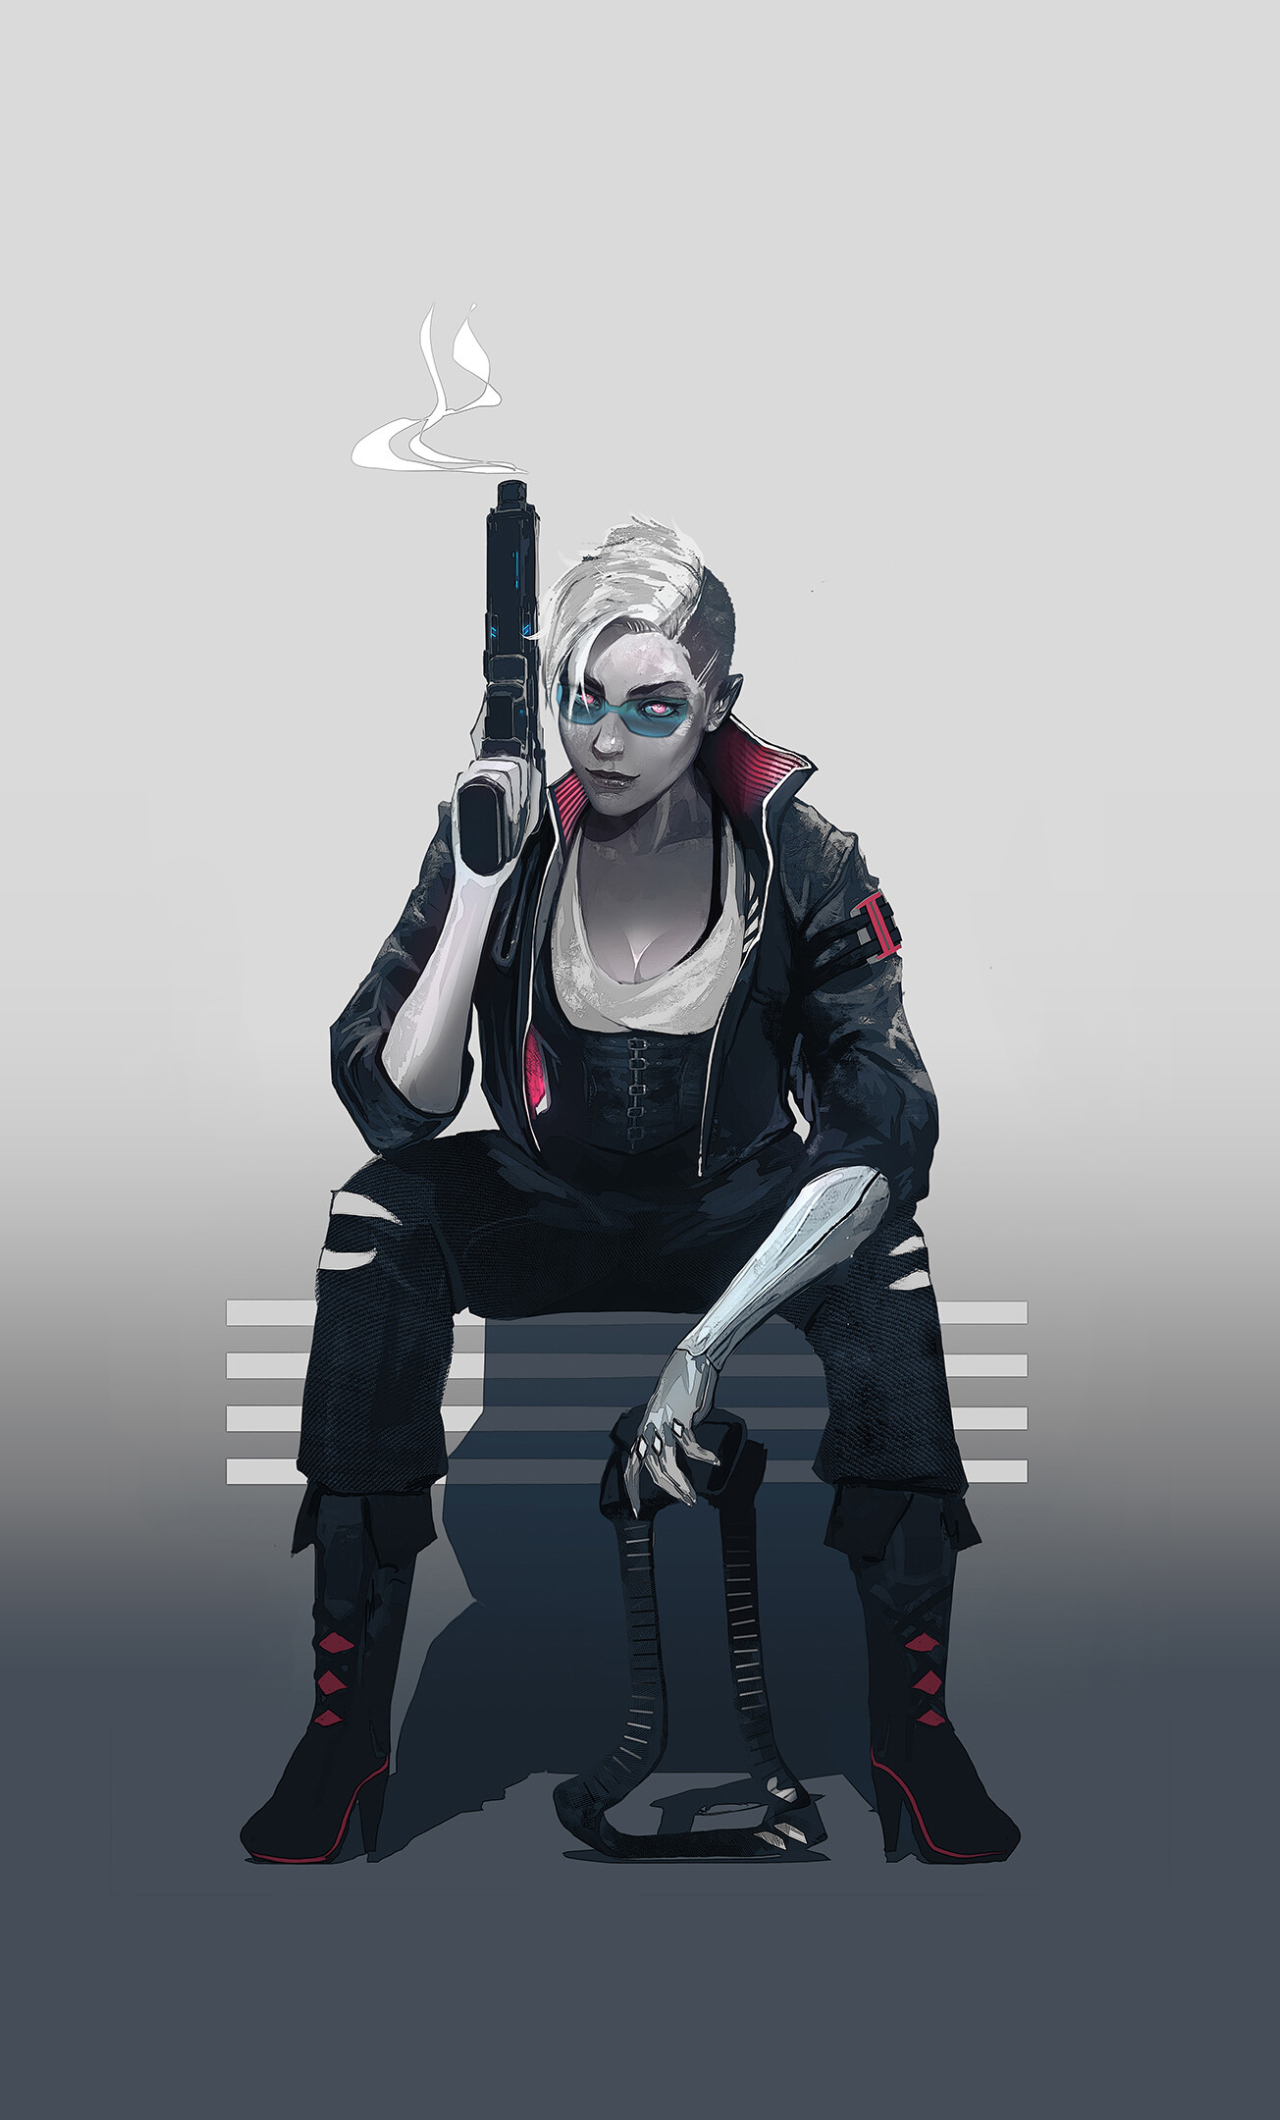 1280x2120 Cyberpunk 2077 Girl 4K iPhone 6 plus Wallpaper ...